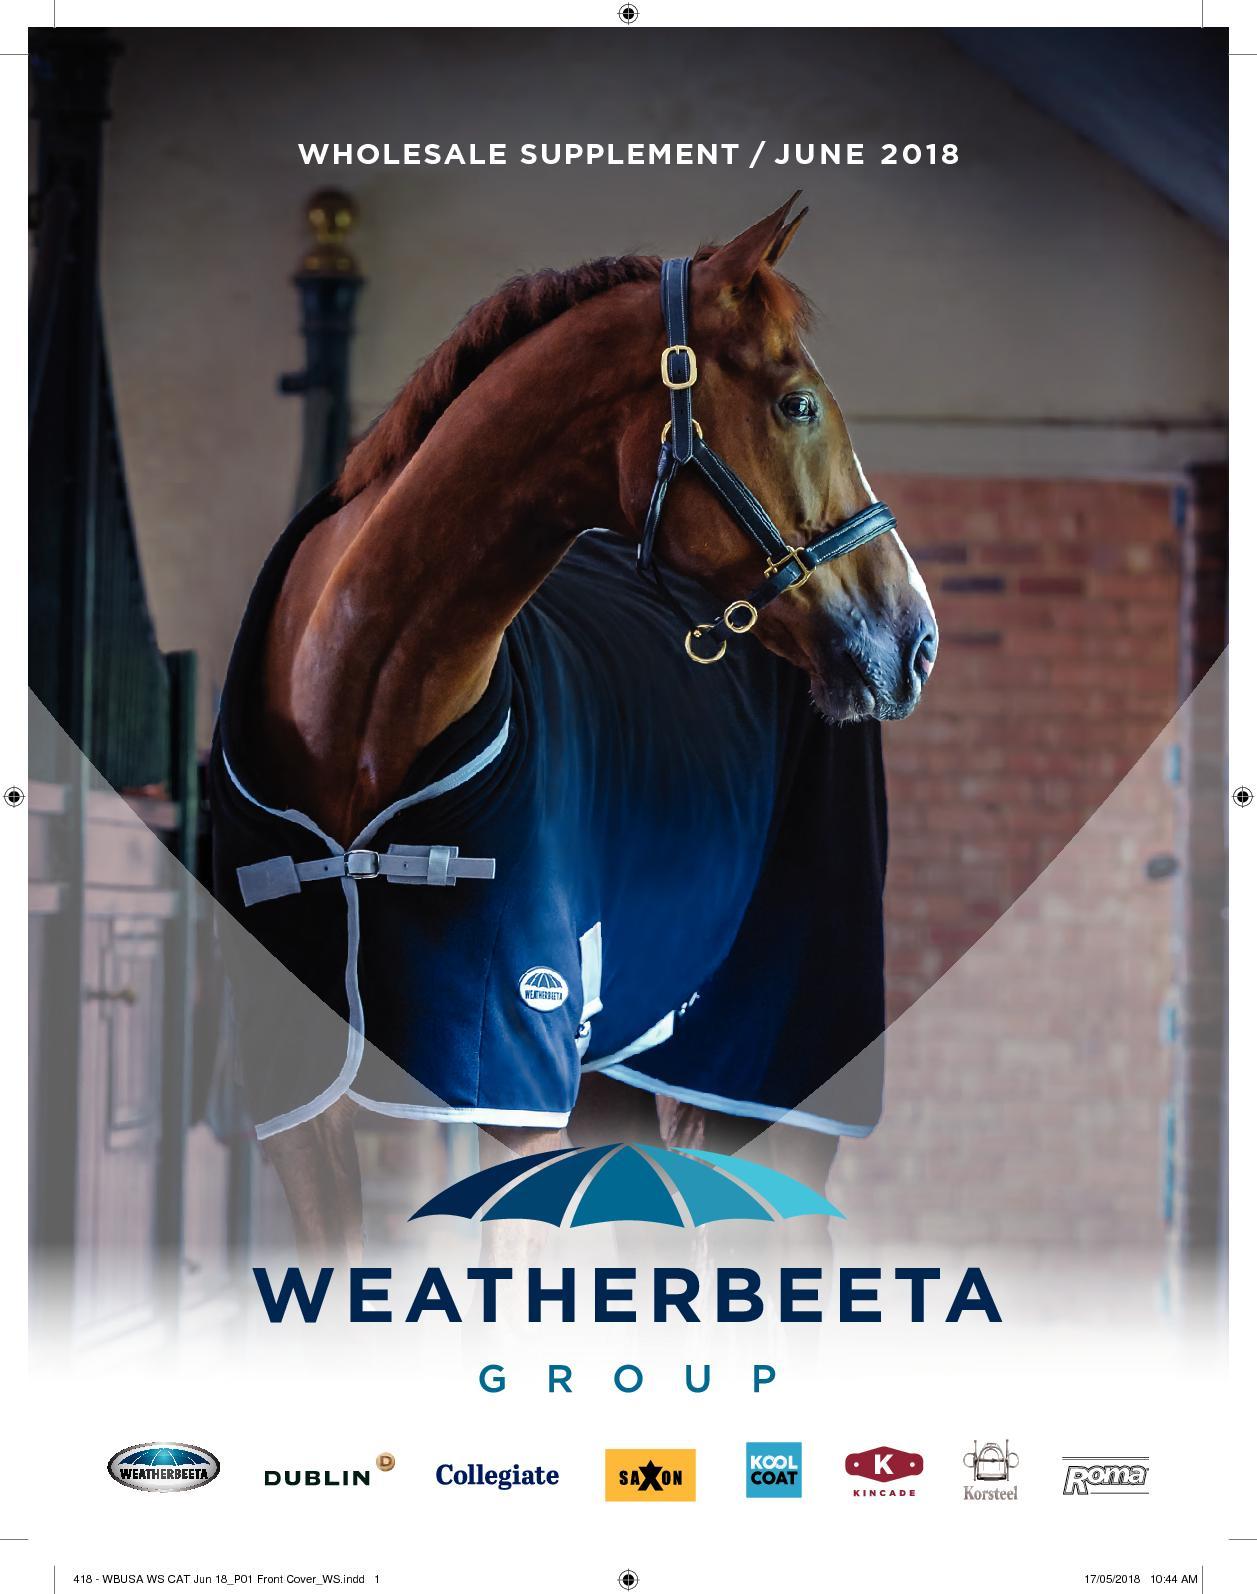 Weatherbeeta Ezi-Dri Standard Neck Fly Rug Blue Purple Lightweight Breathable